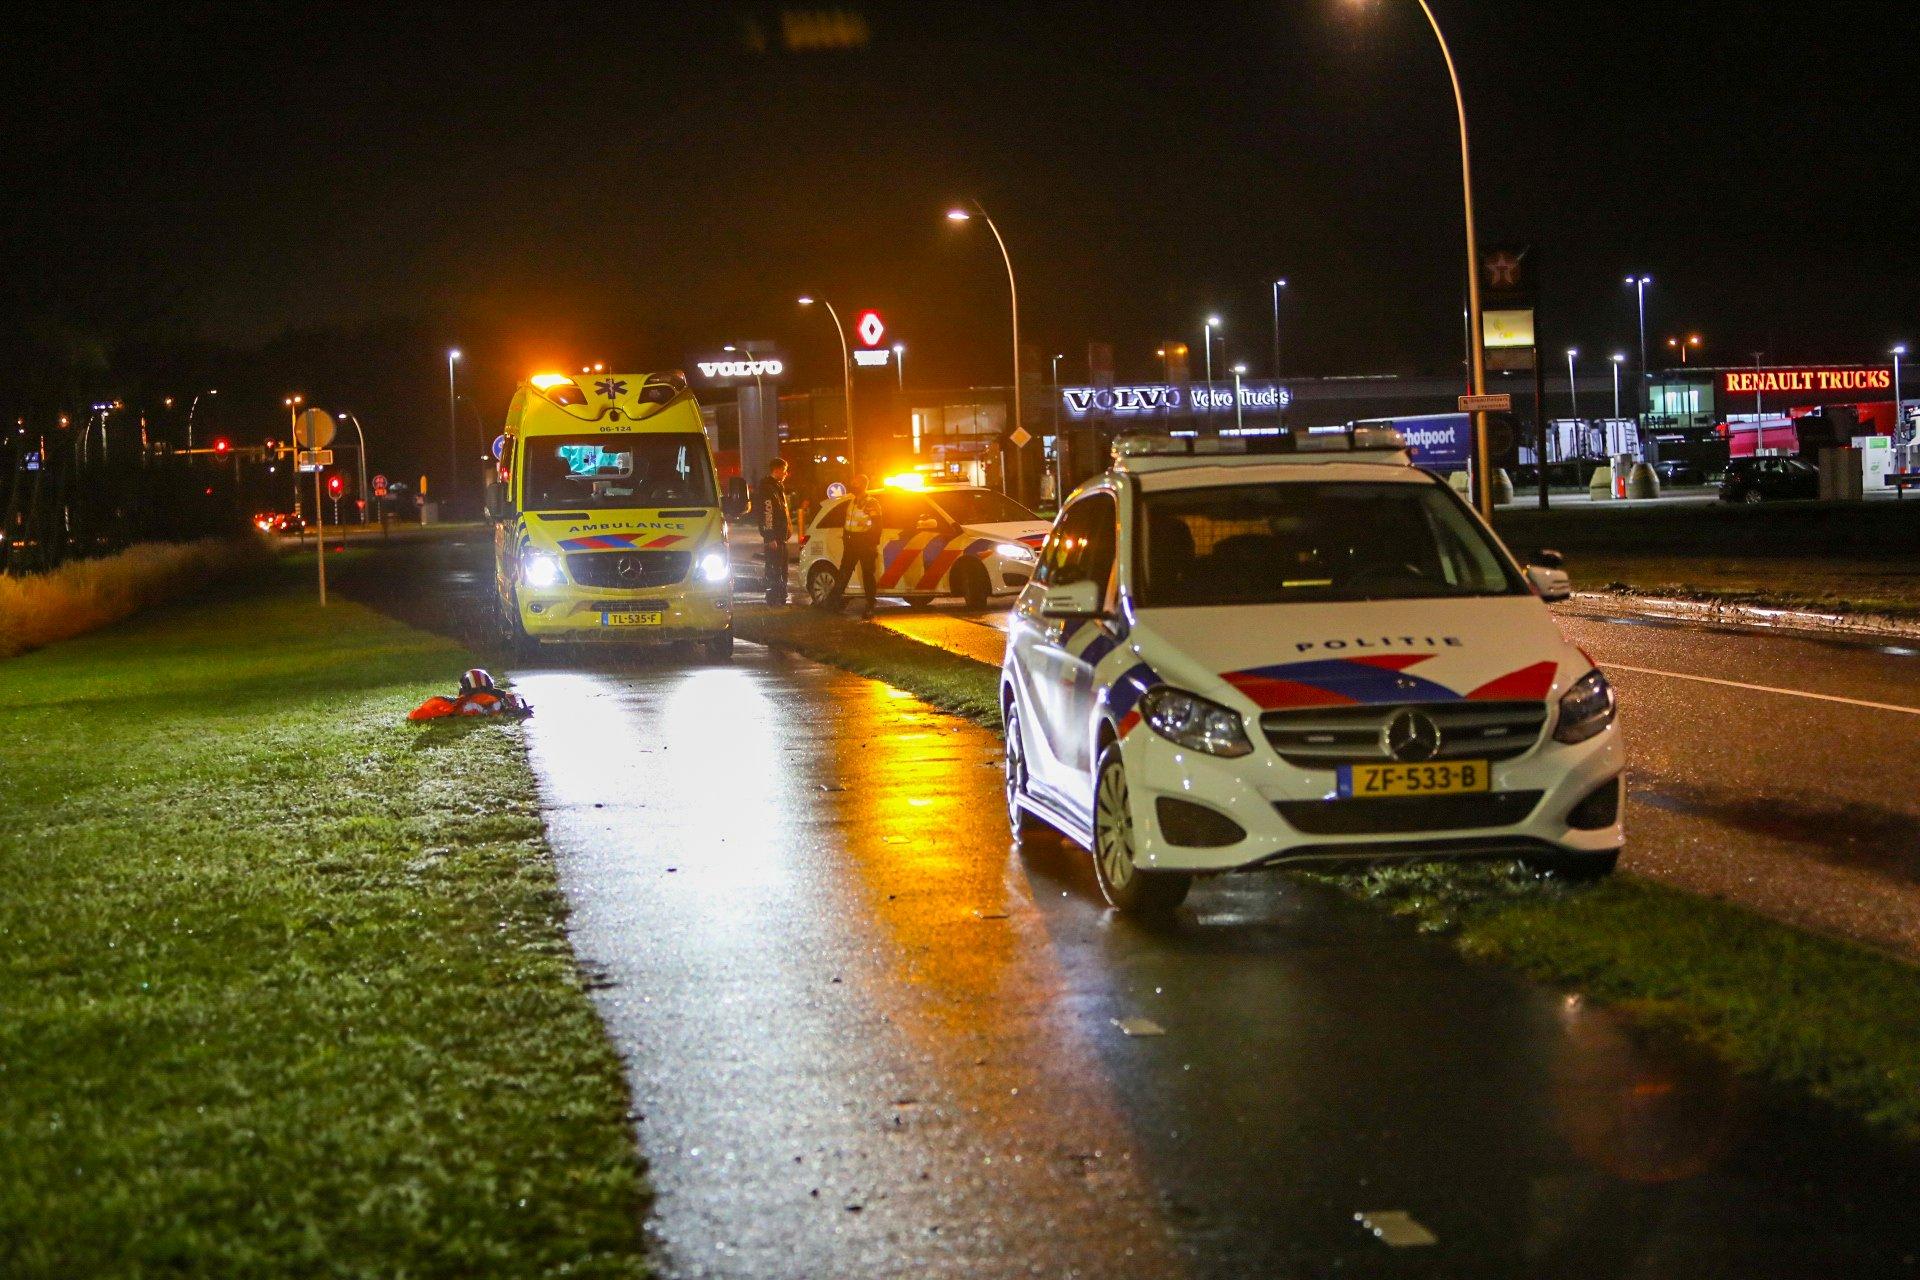 Voetganger gewond na botsing met scooter in Apeldoorn